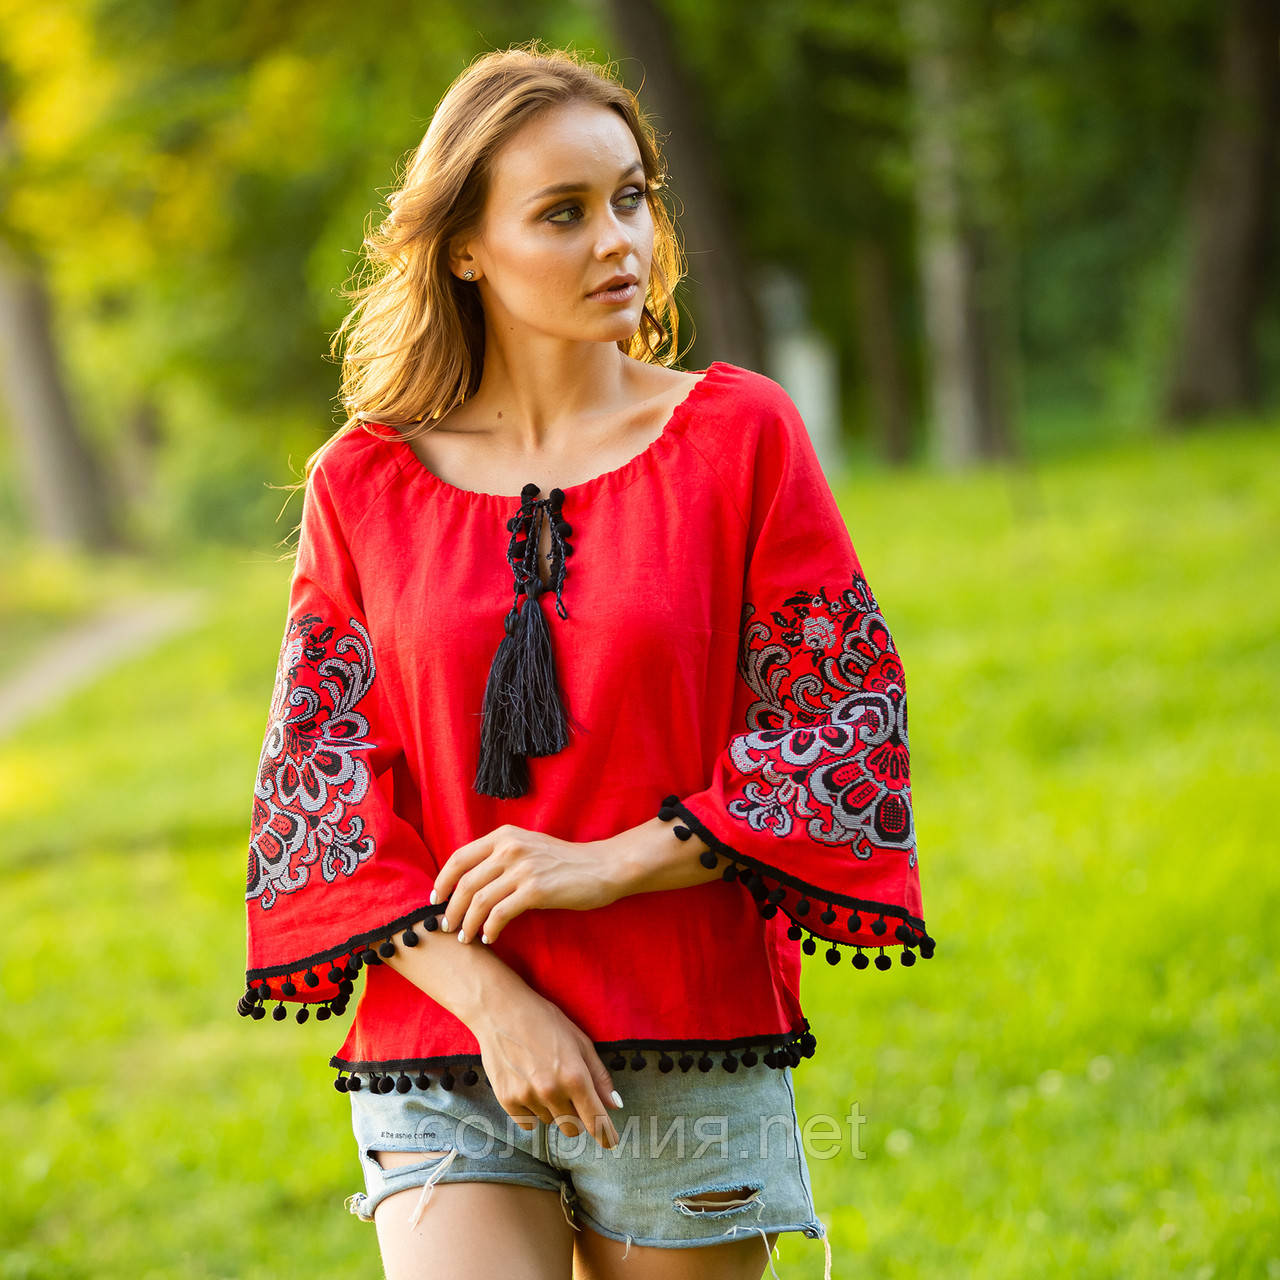 Эффектная женская вышитая блуза. Вышиванка